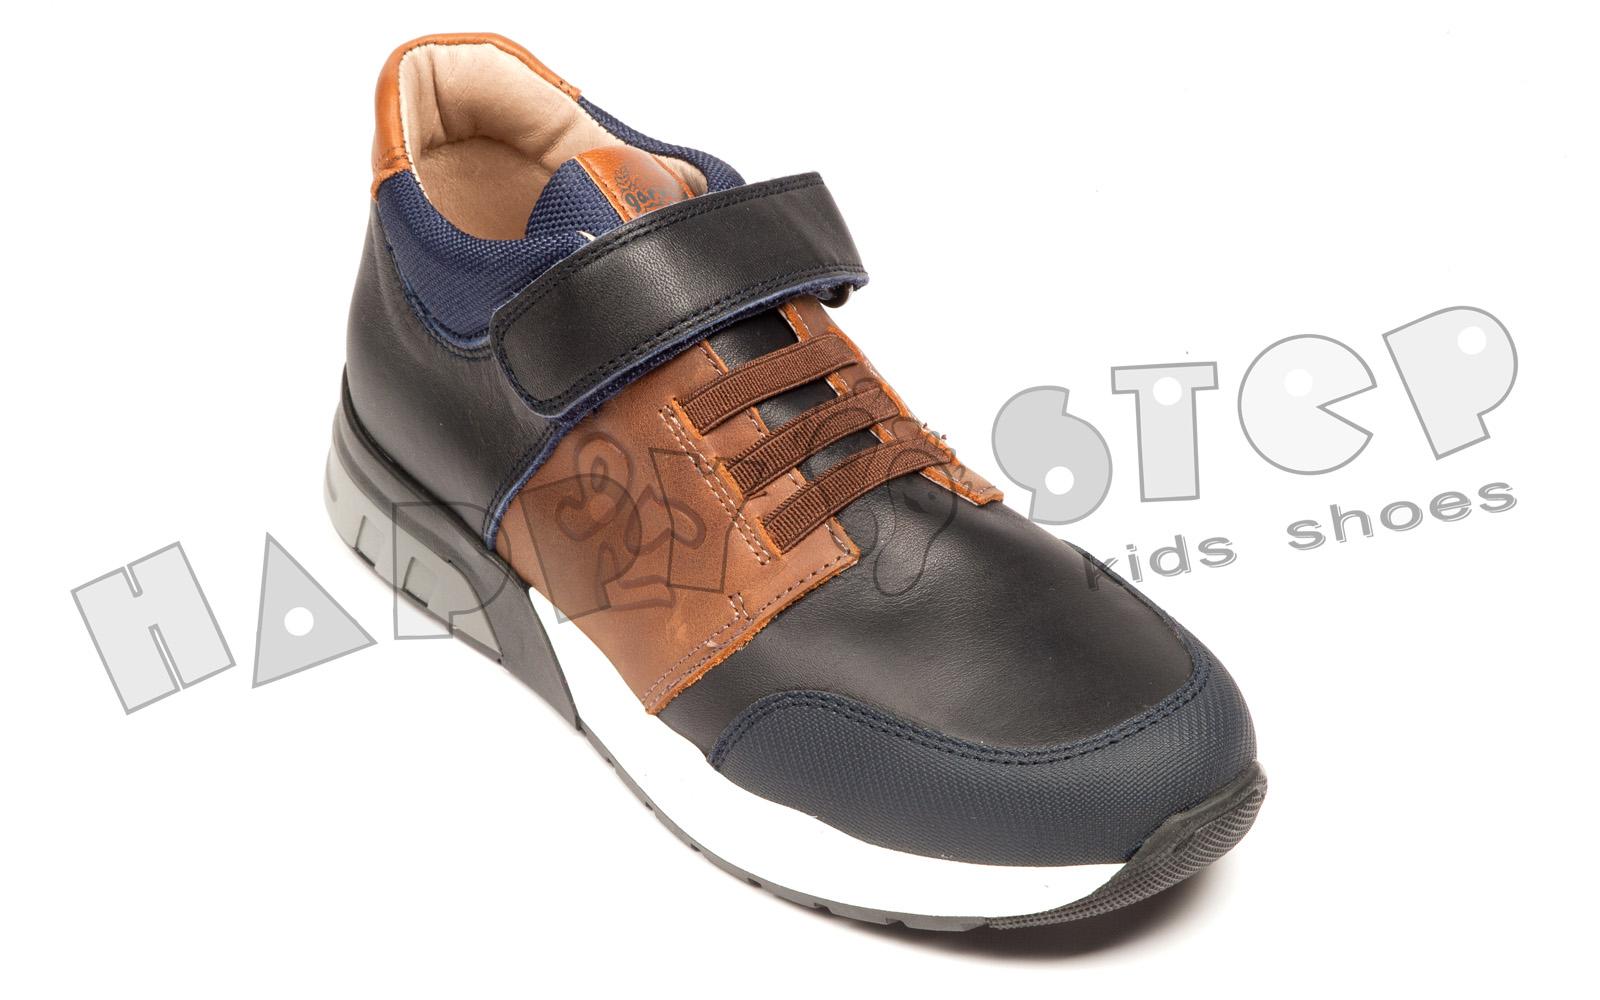 GARVALIN 181642 - Παιδικά παπούτσια Happy Step 4f62f3018ef